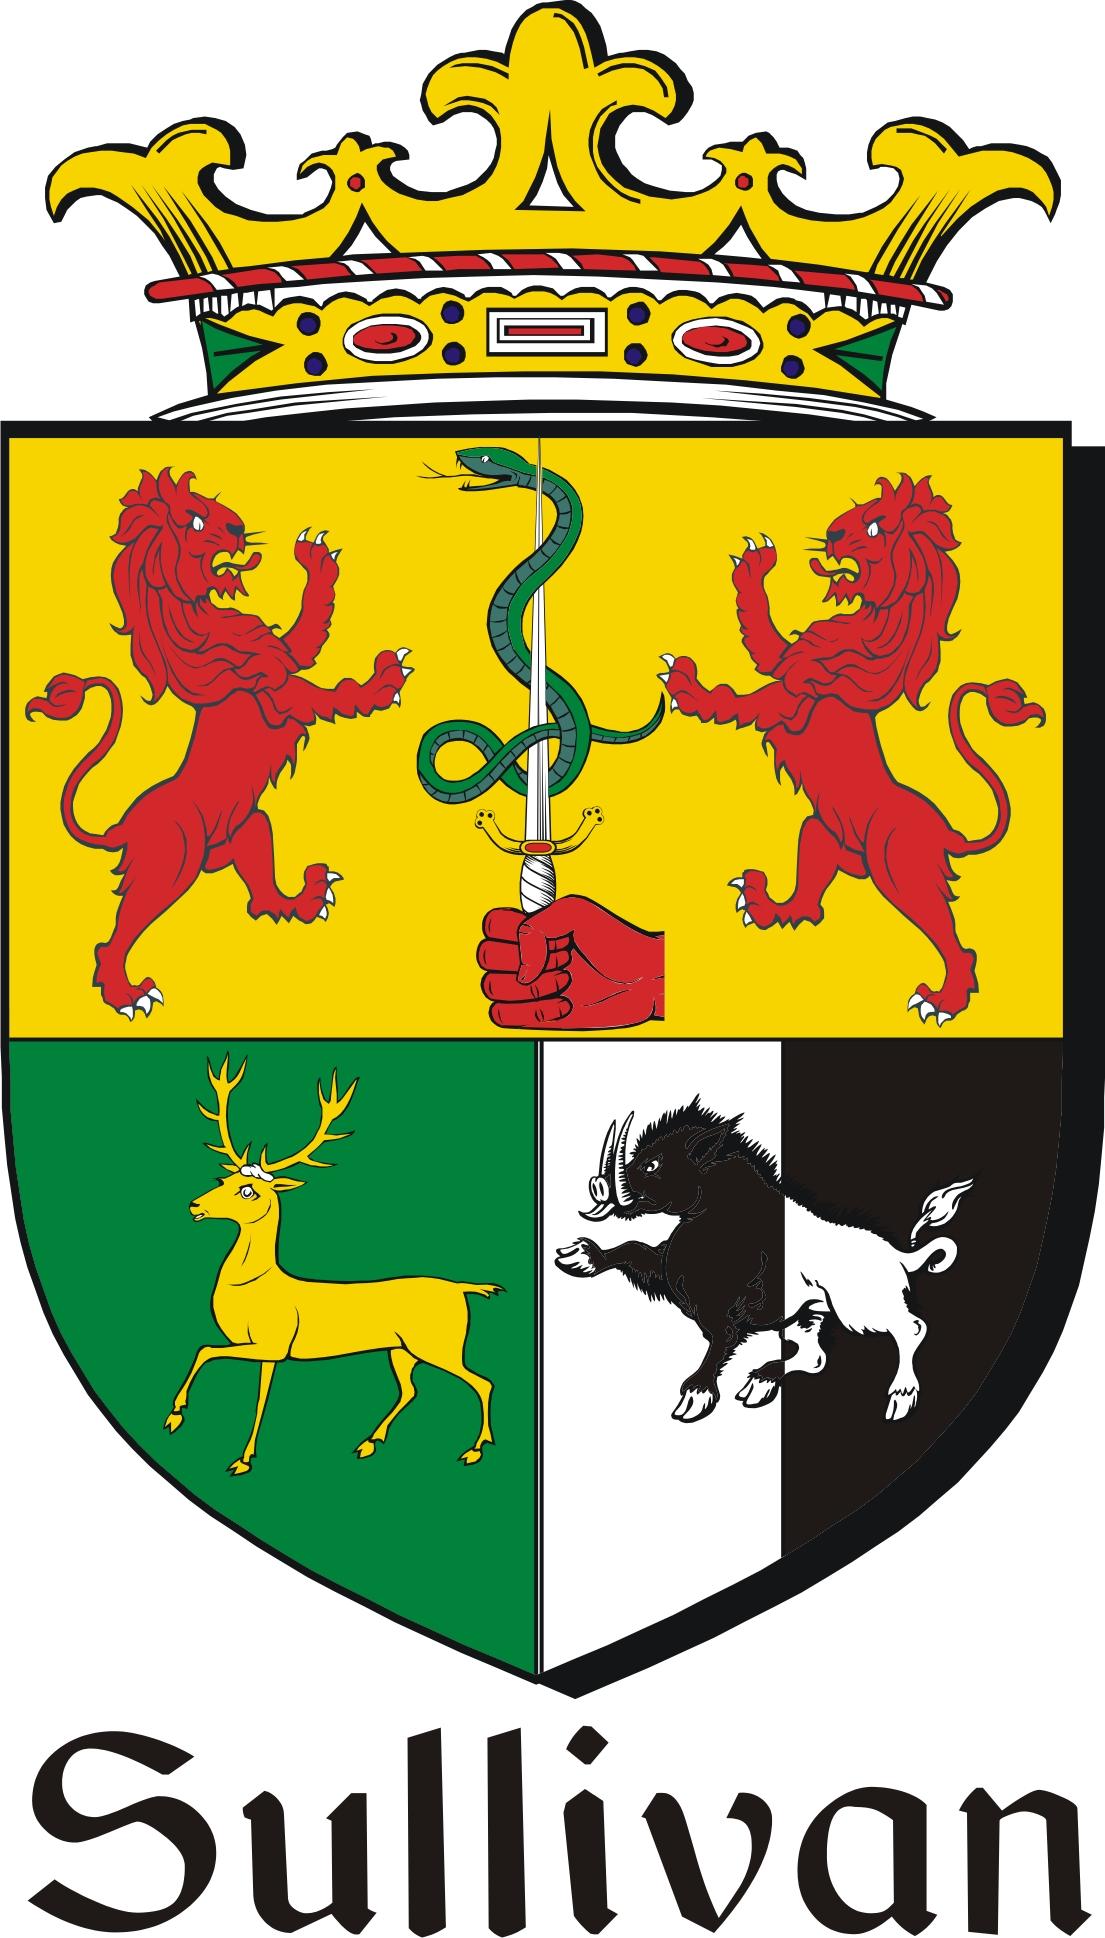 Sullivan Family Crest Irish Coat Of Arms Image Download Downloa